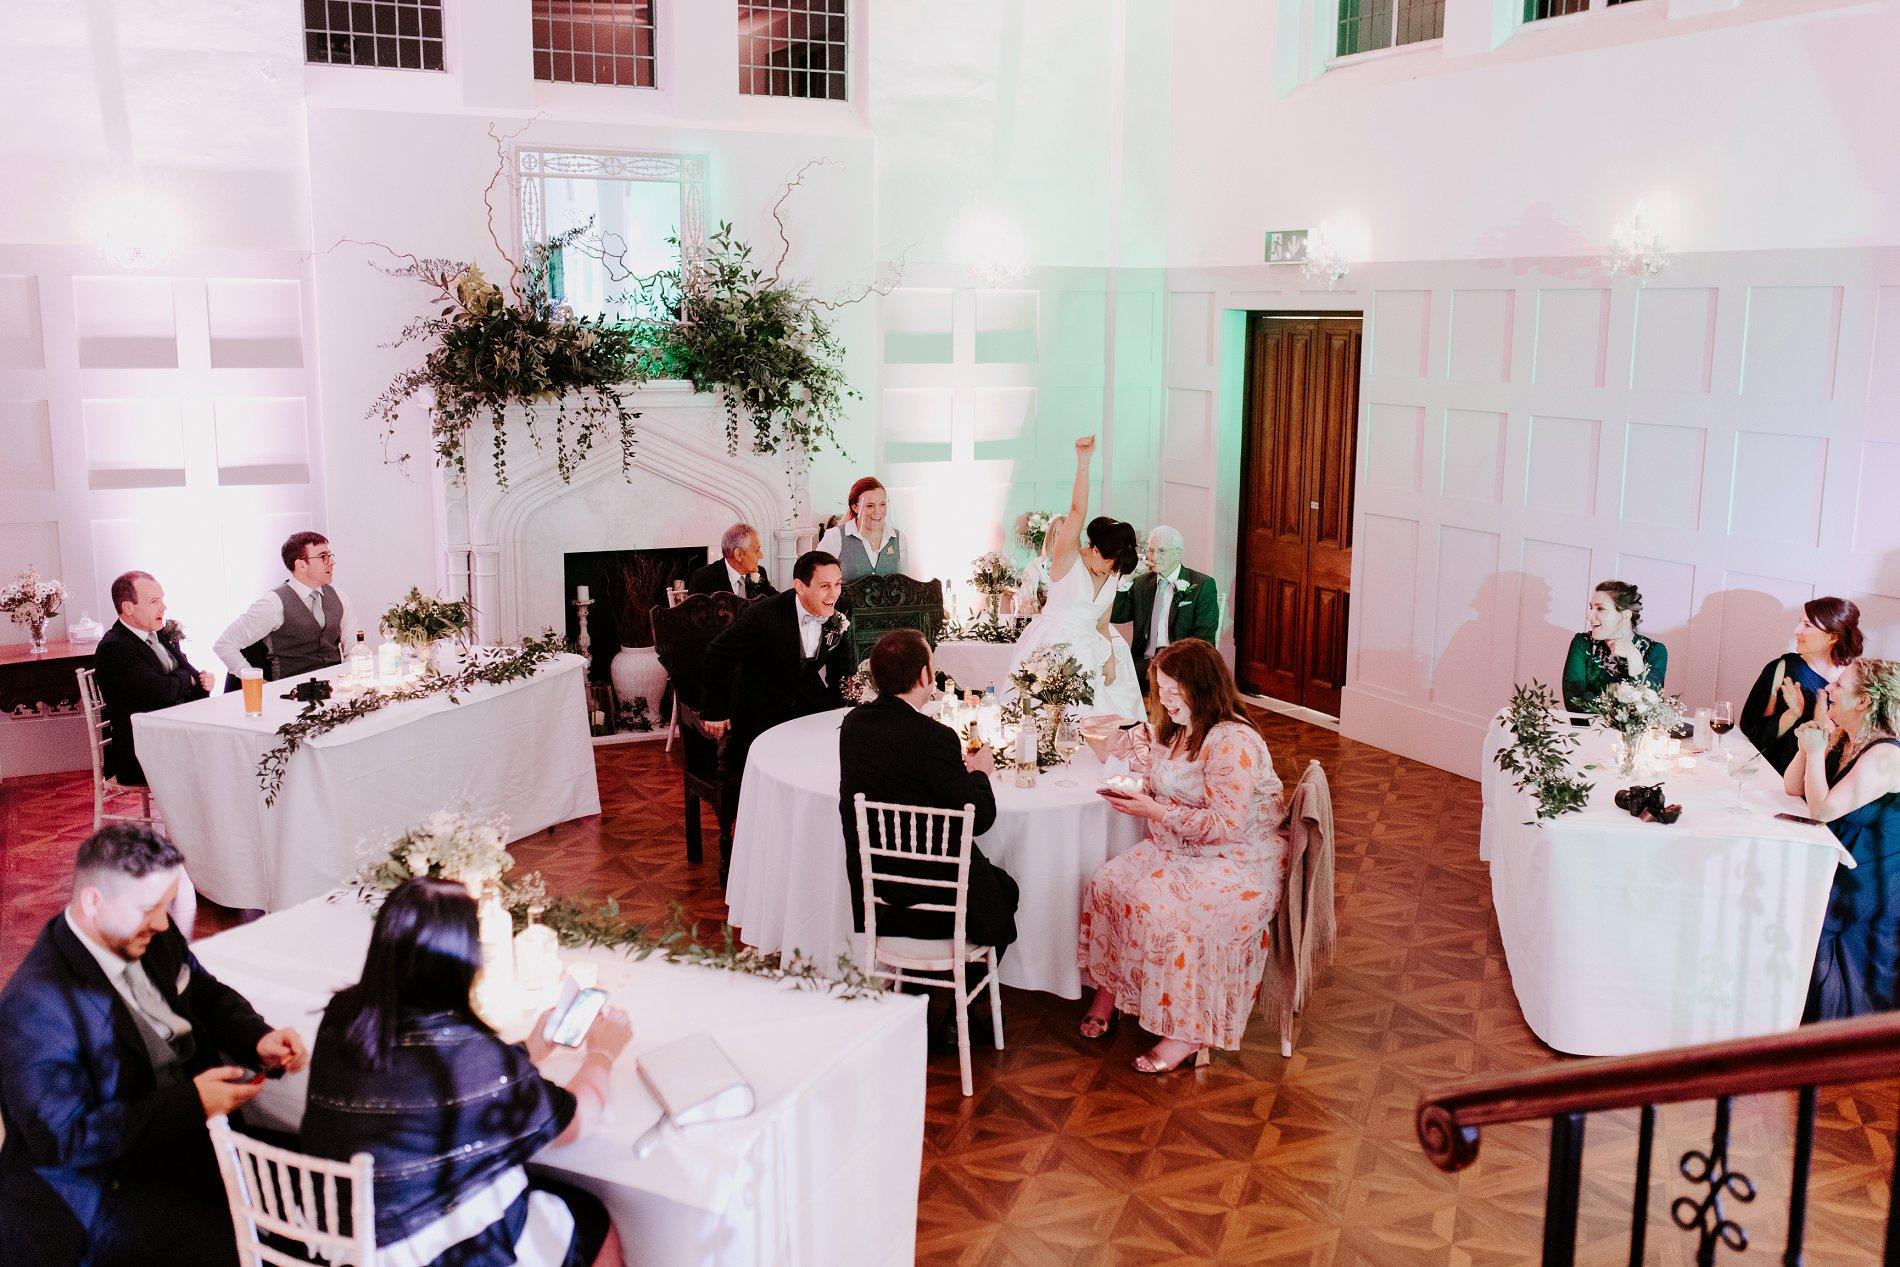 An Elegant White Wedding at Thicket Priory (c) Carla Whittingham Photography (93)